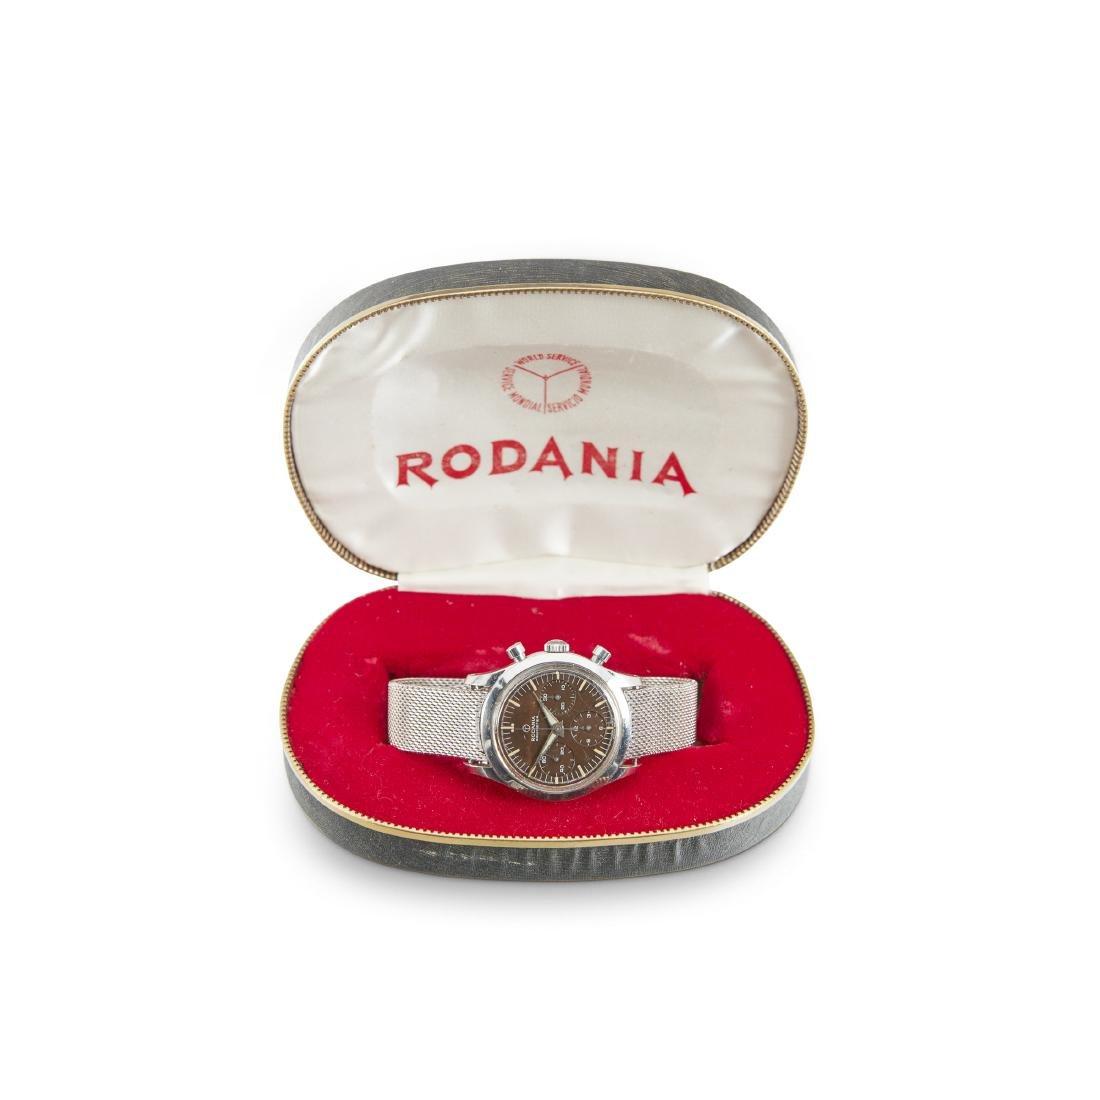 Rodania, Geometer, Ref. 5621H